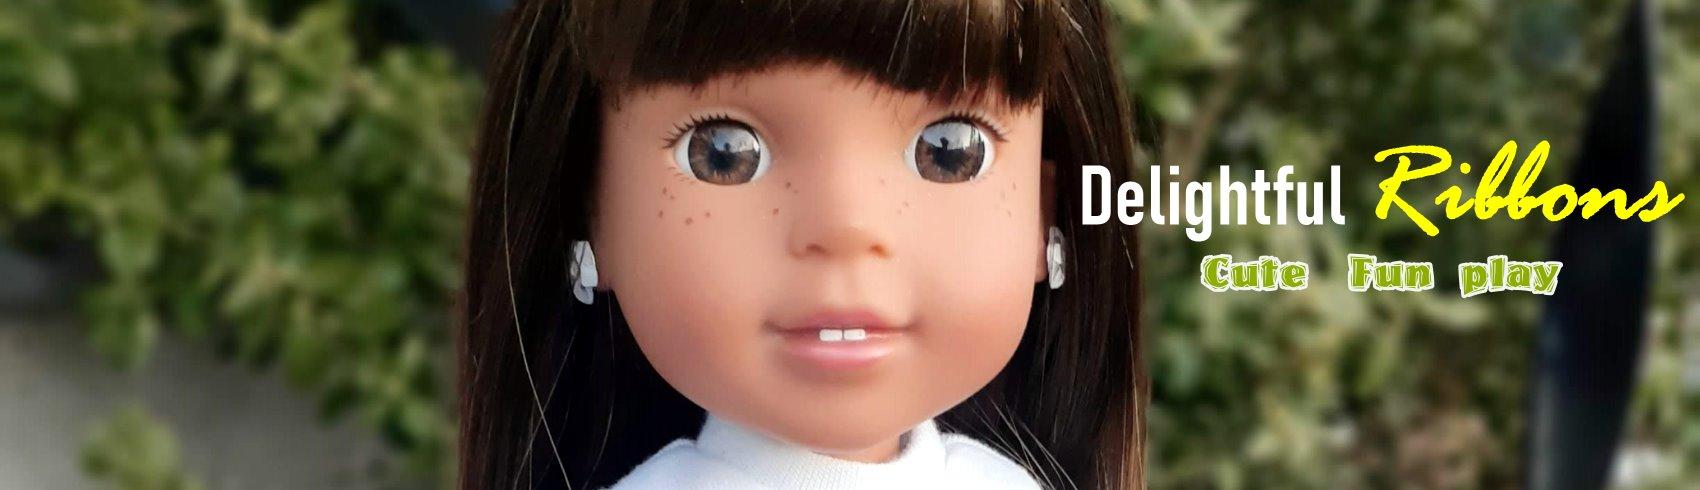 doll-clothes-header2.jpg